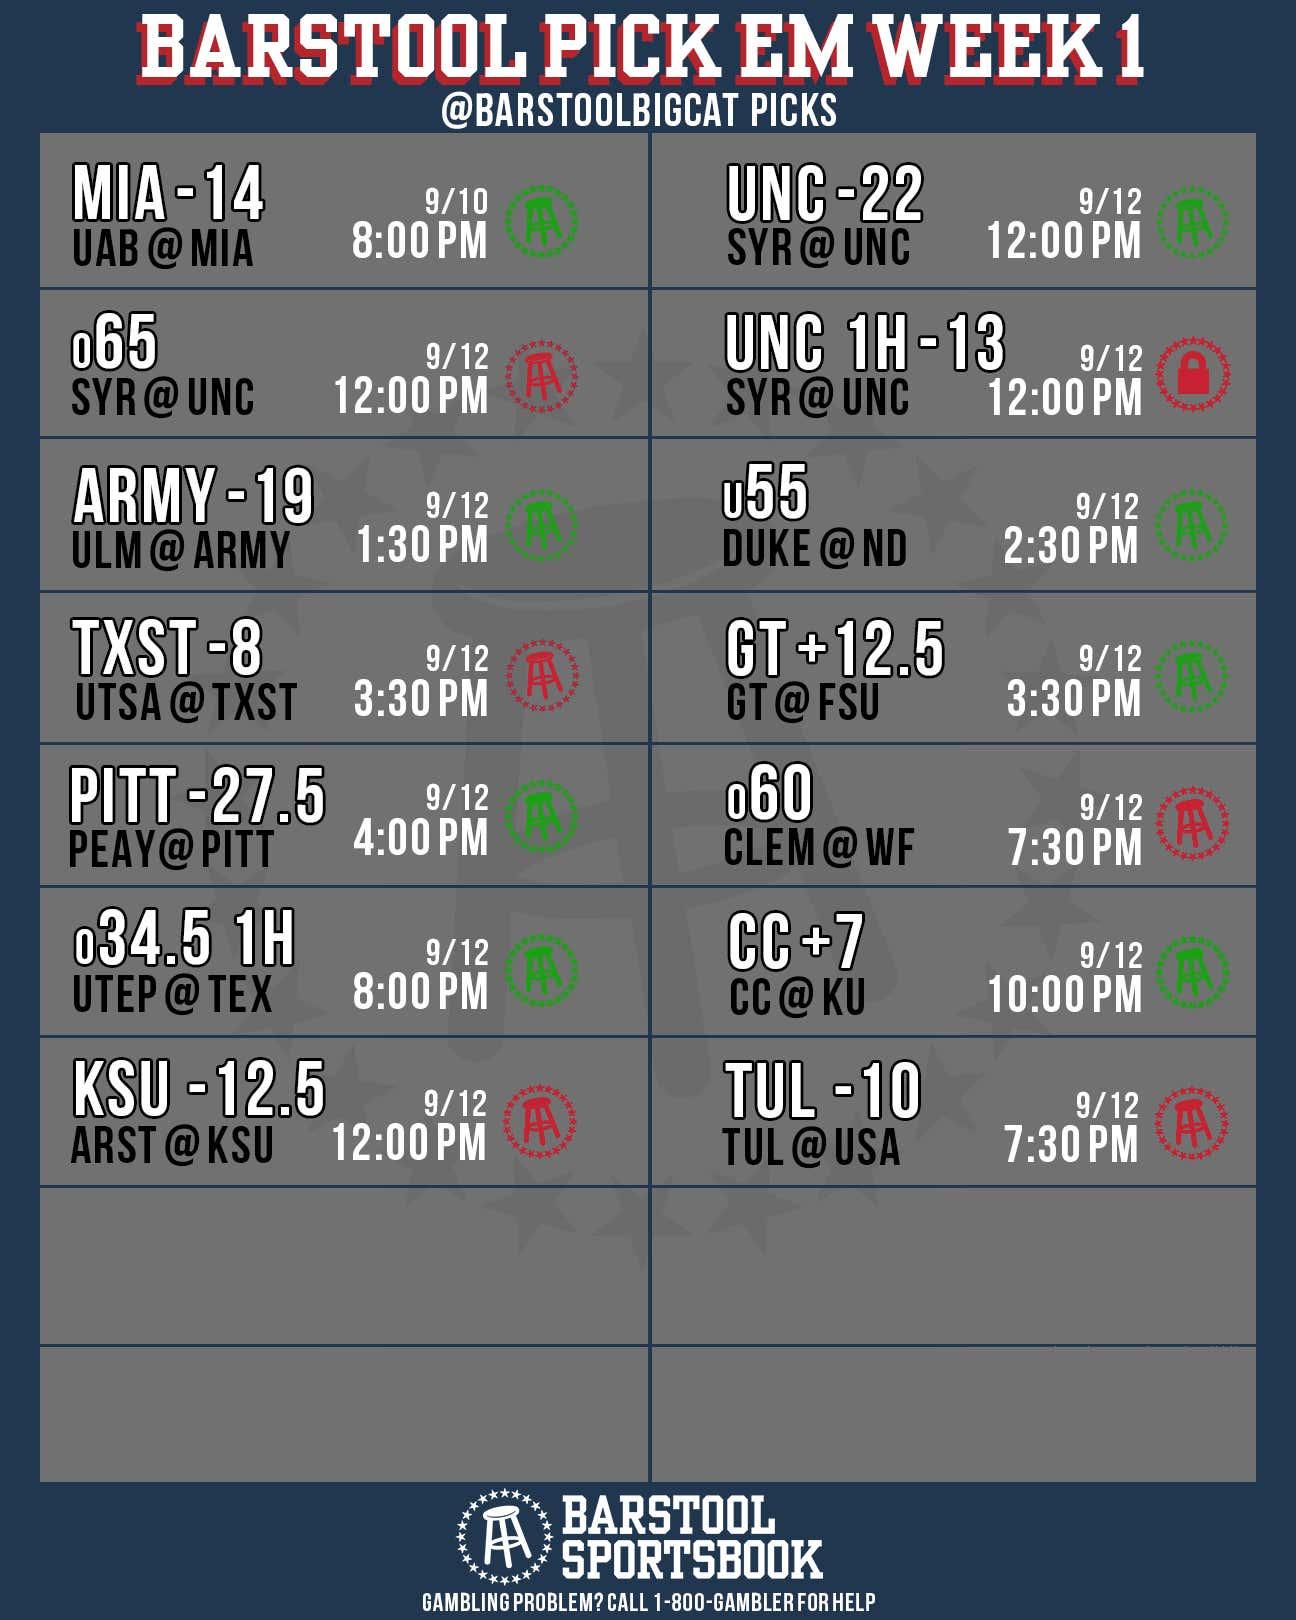 Barstool Pick Em Week 2 Results Barstool Bets